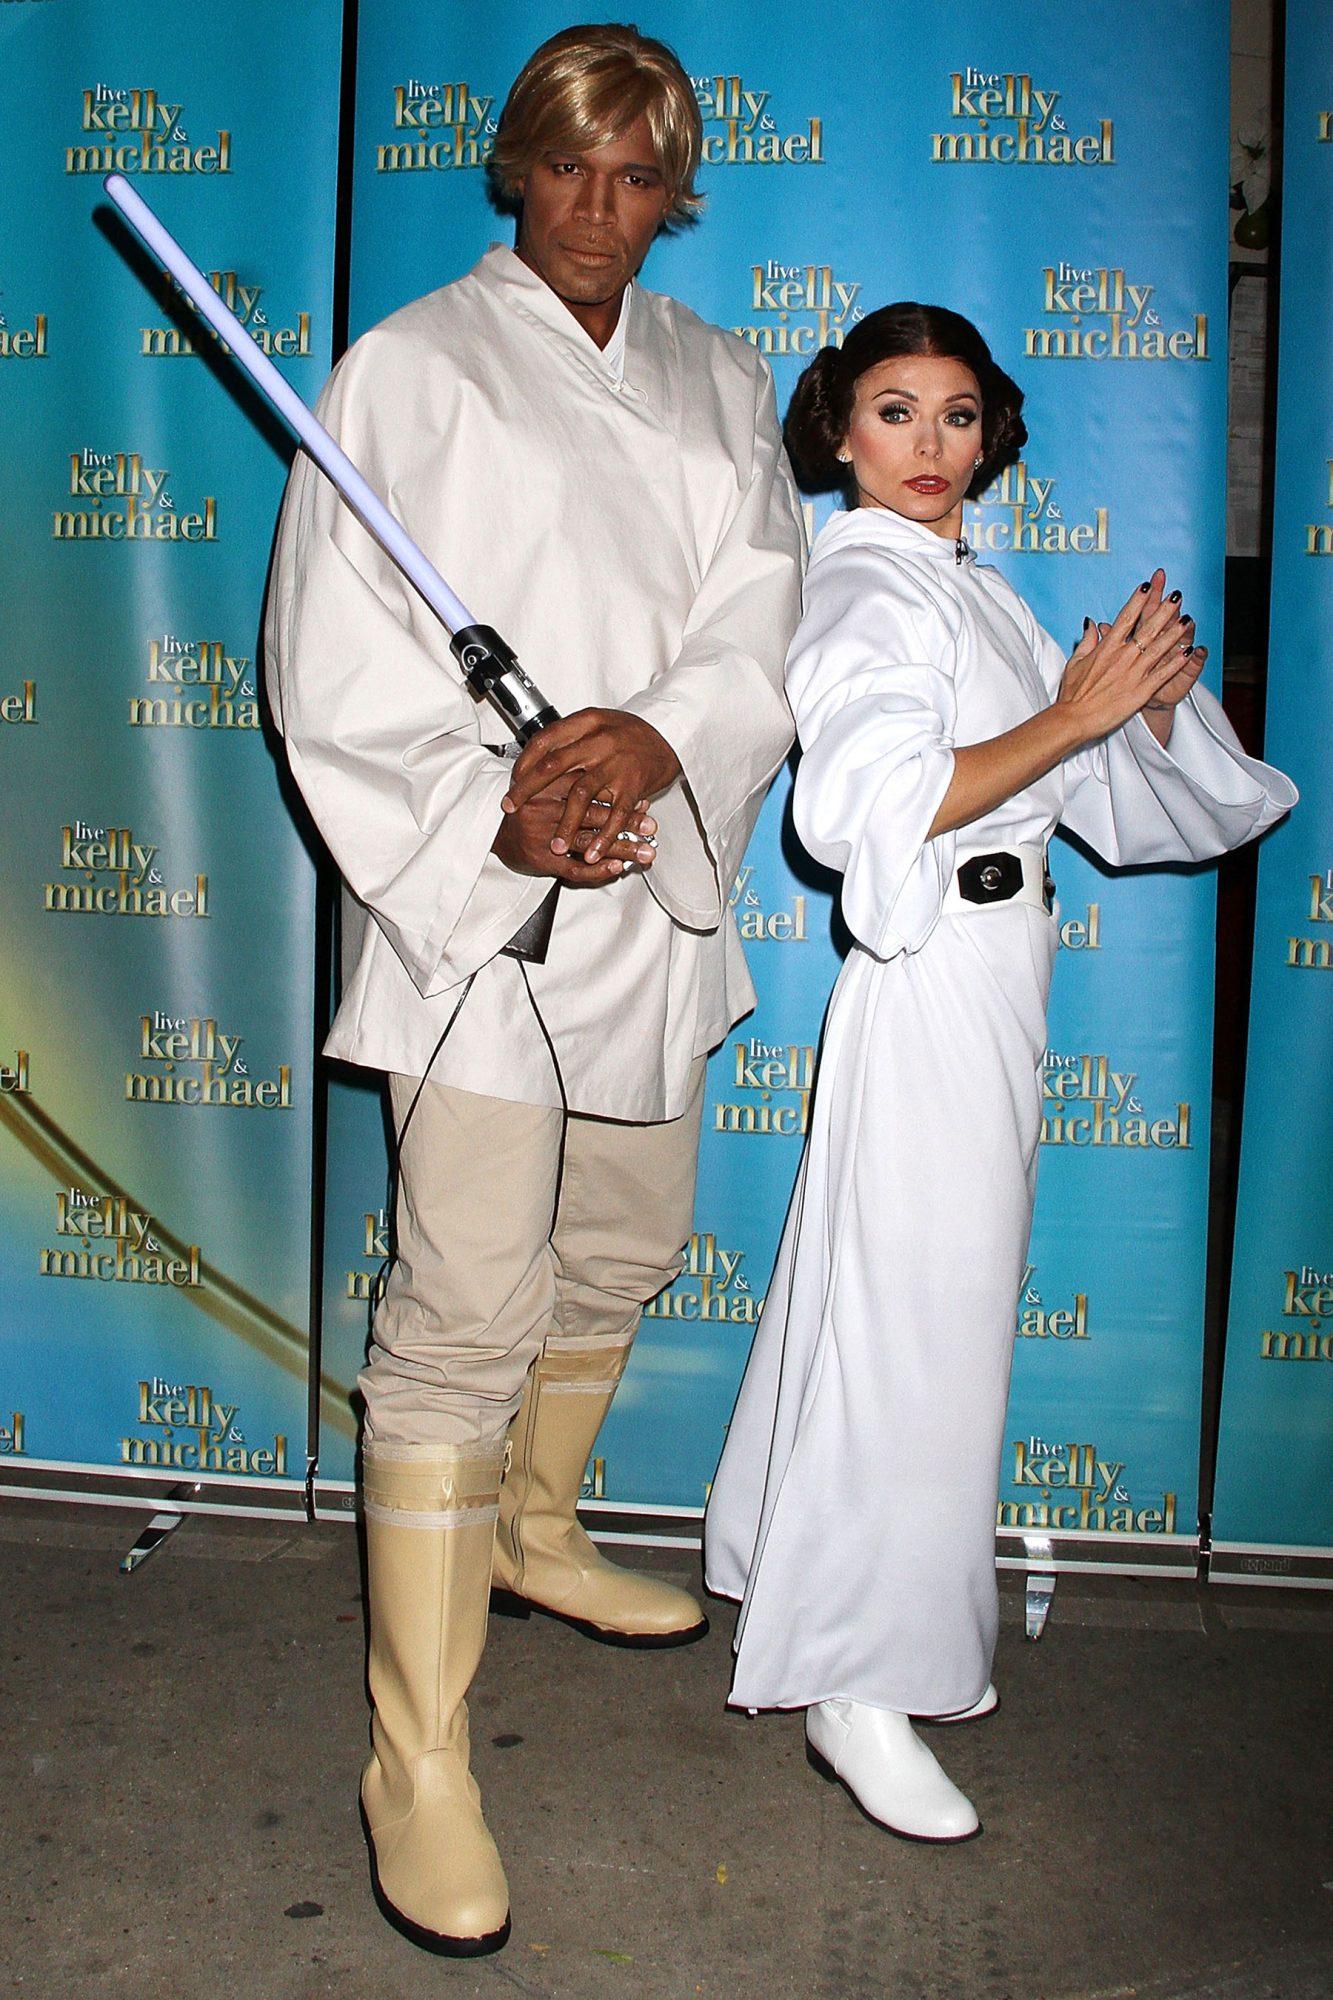 Kelly & Michael LIVE's 2015 Halloween Show